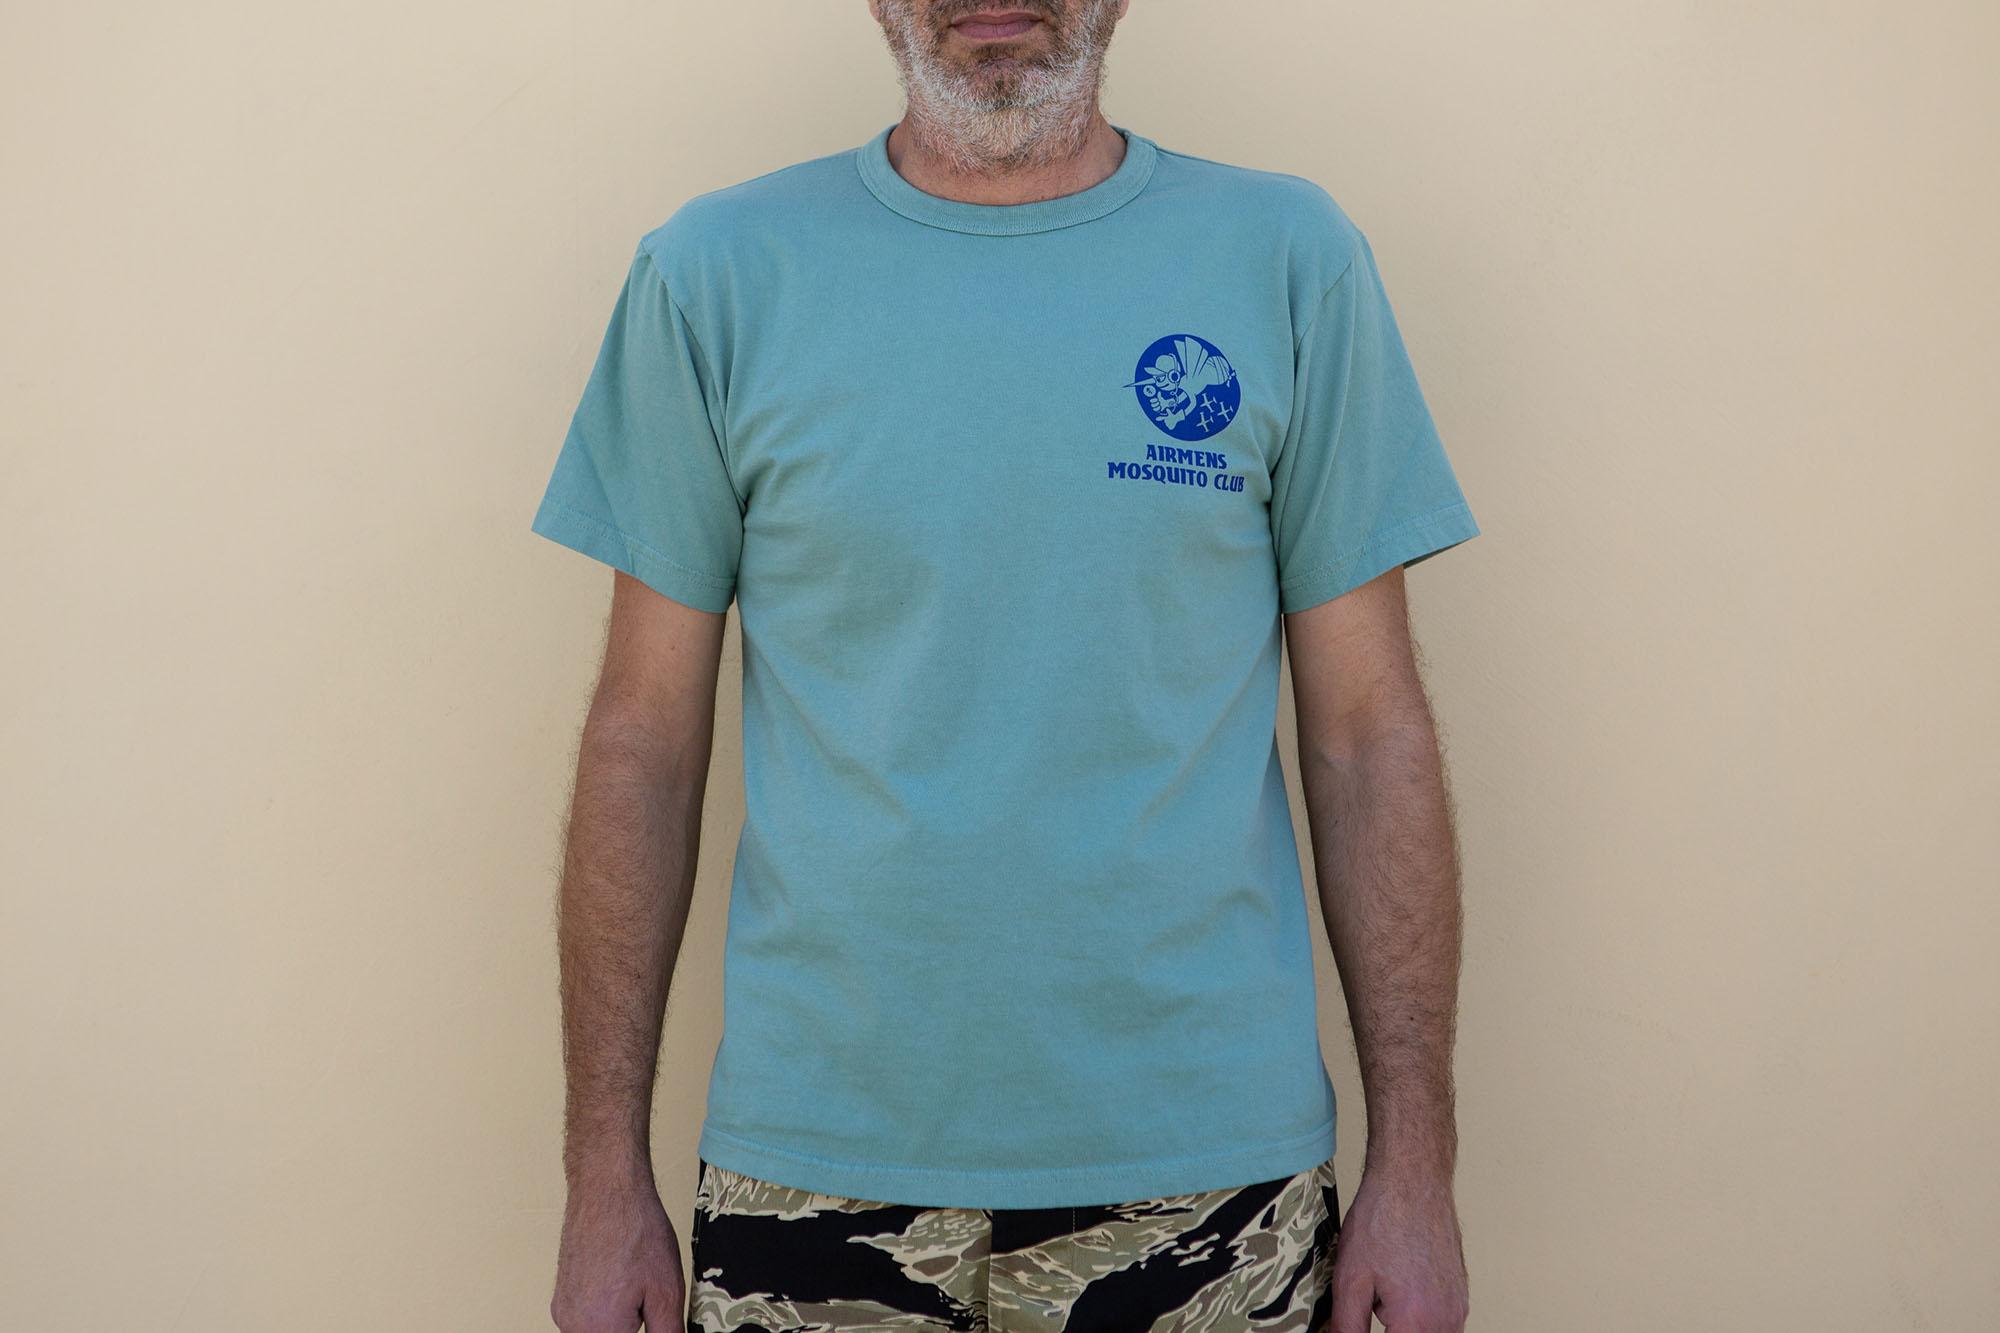 T-Shirt Mosquito Club